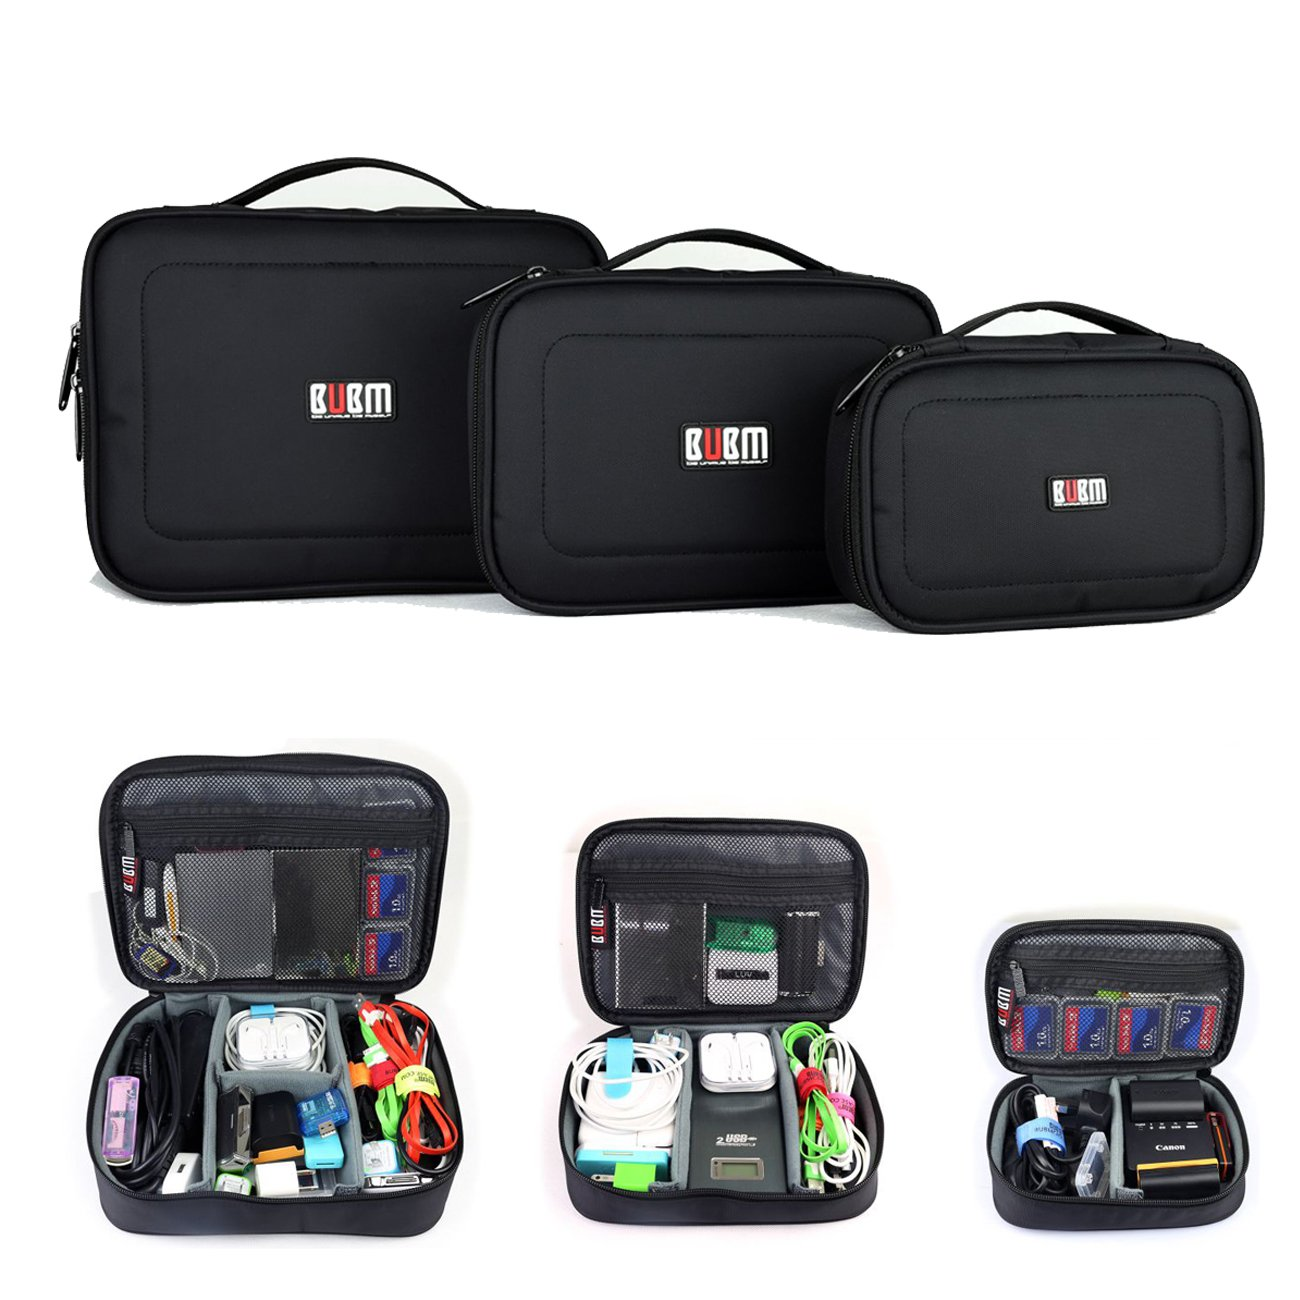 Amazon.com: BUBM Waterproof 3pcs/set Portable Electronic ...